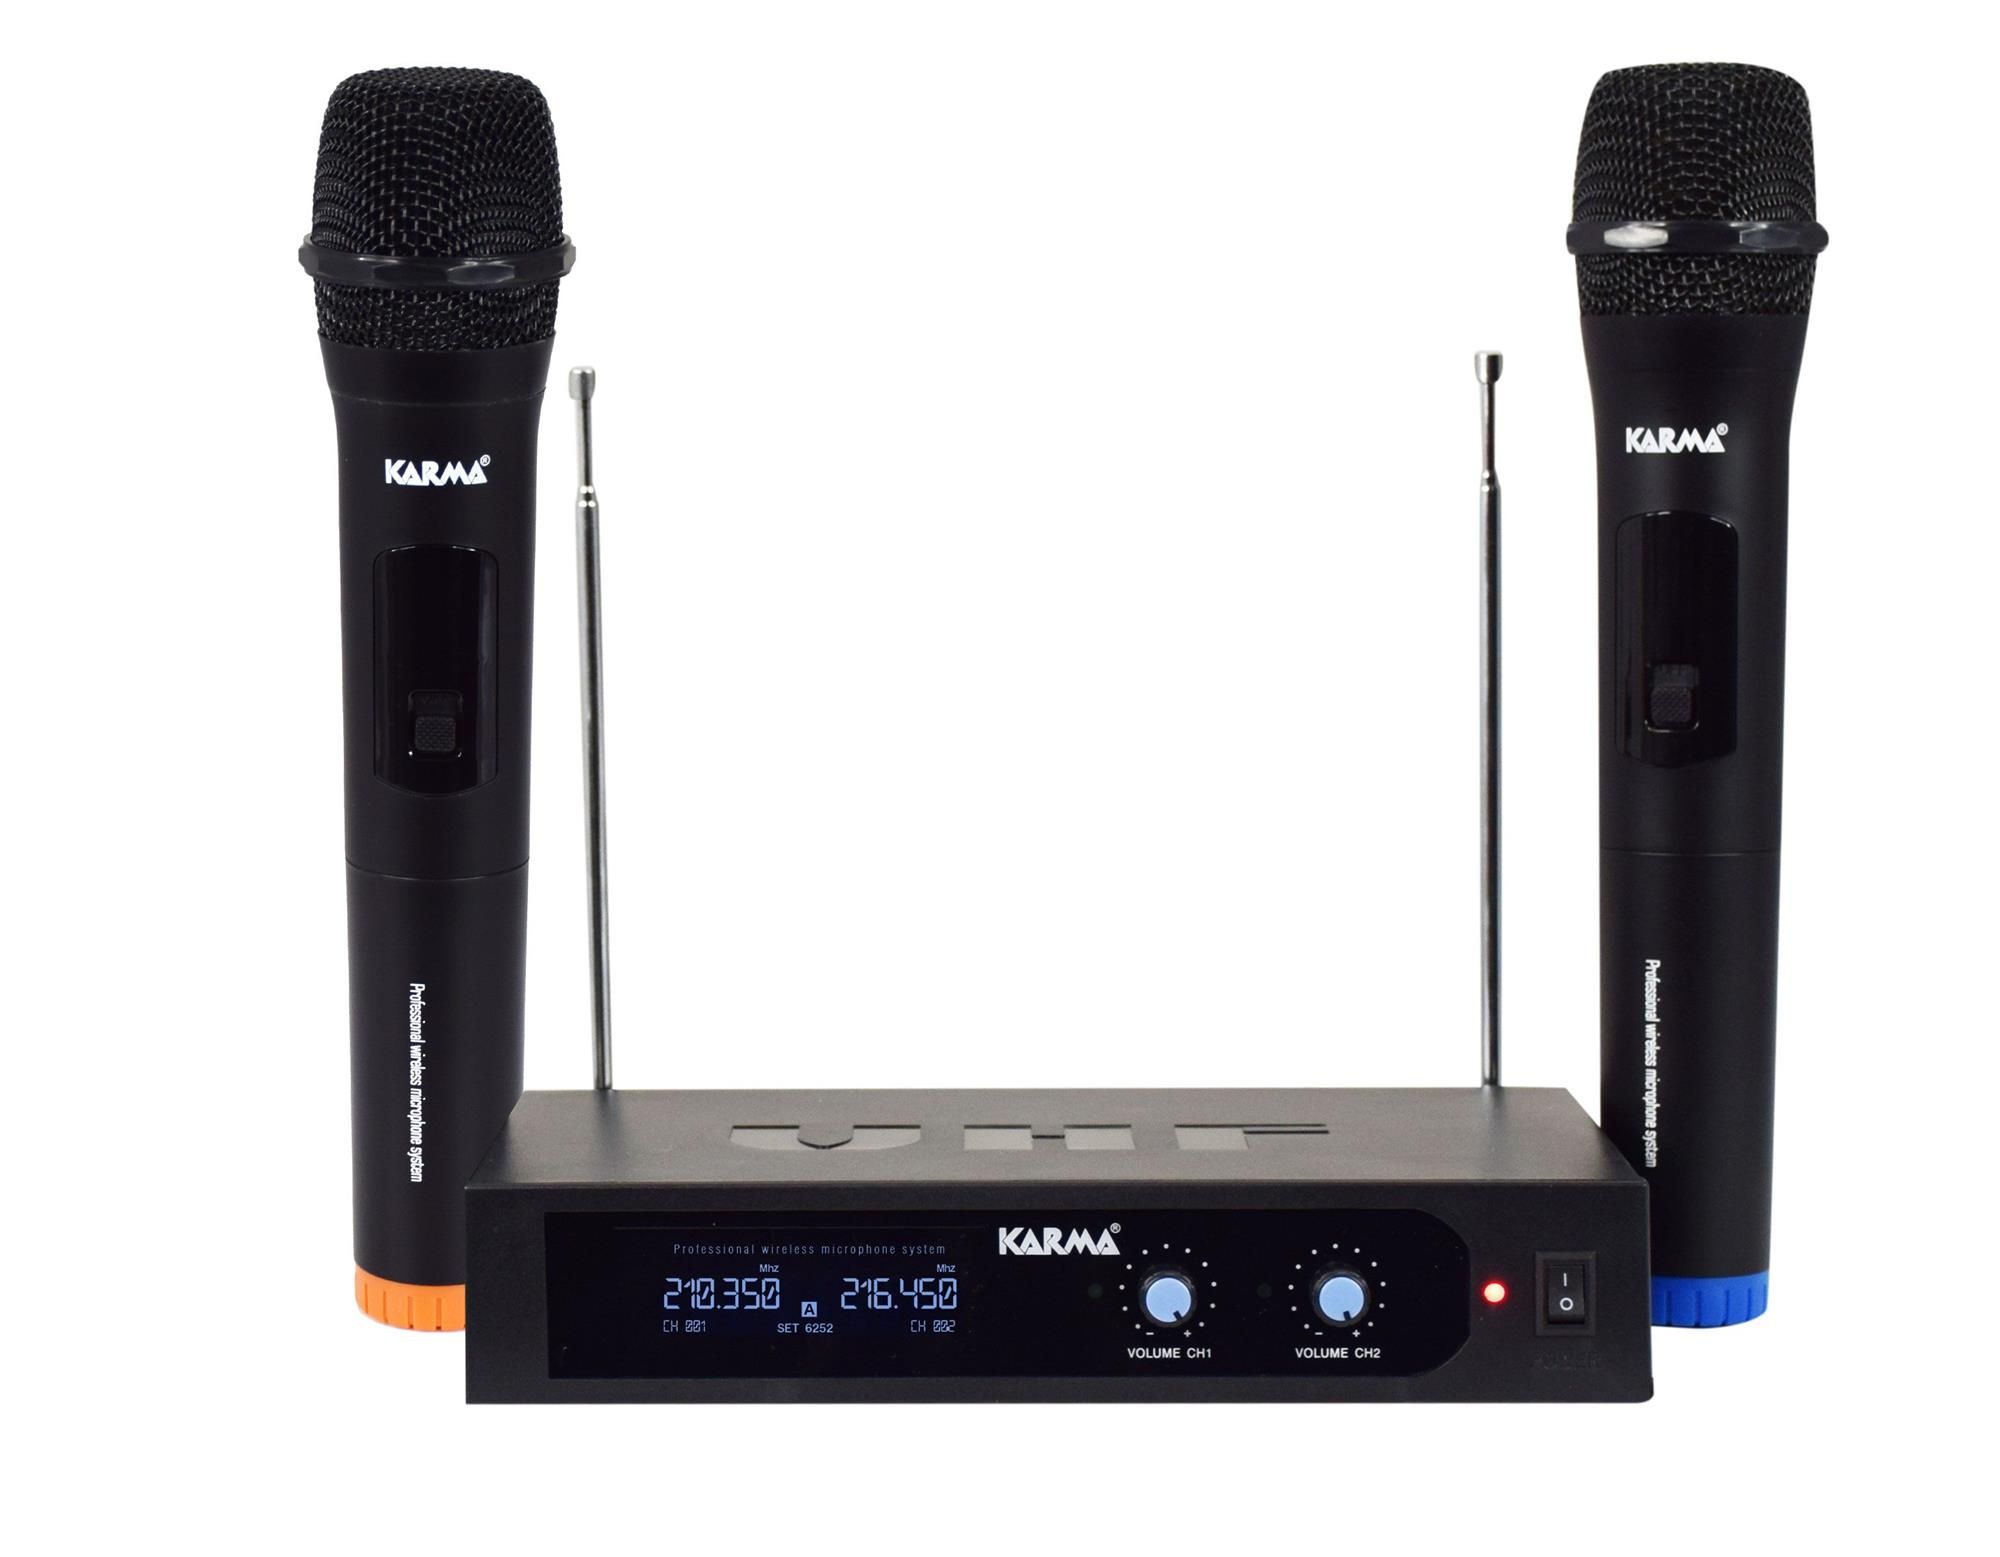 KARMA-SET-6252A-Doppio-radiomicrofono-palmare-VHF-sku-24794